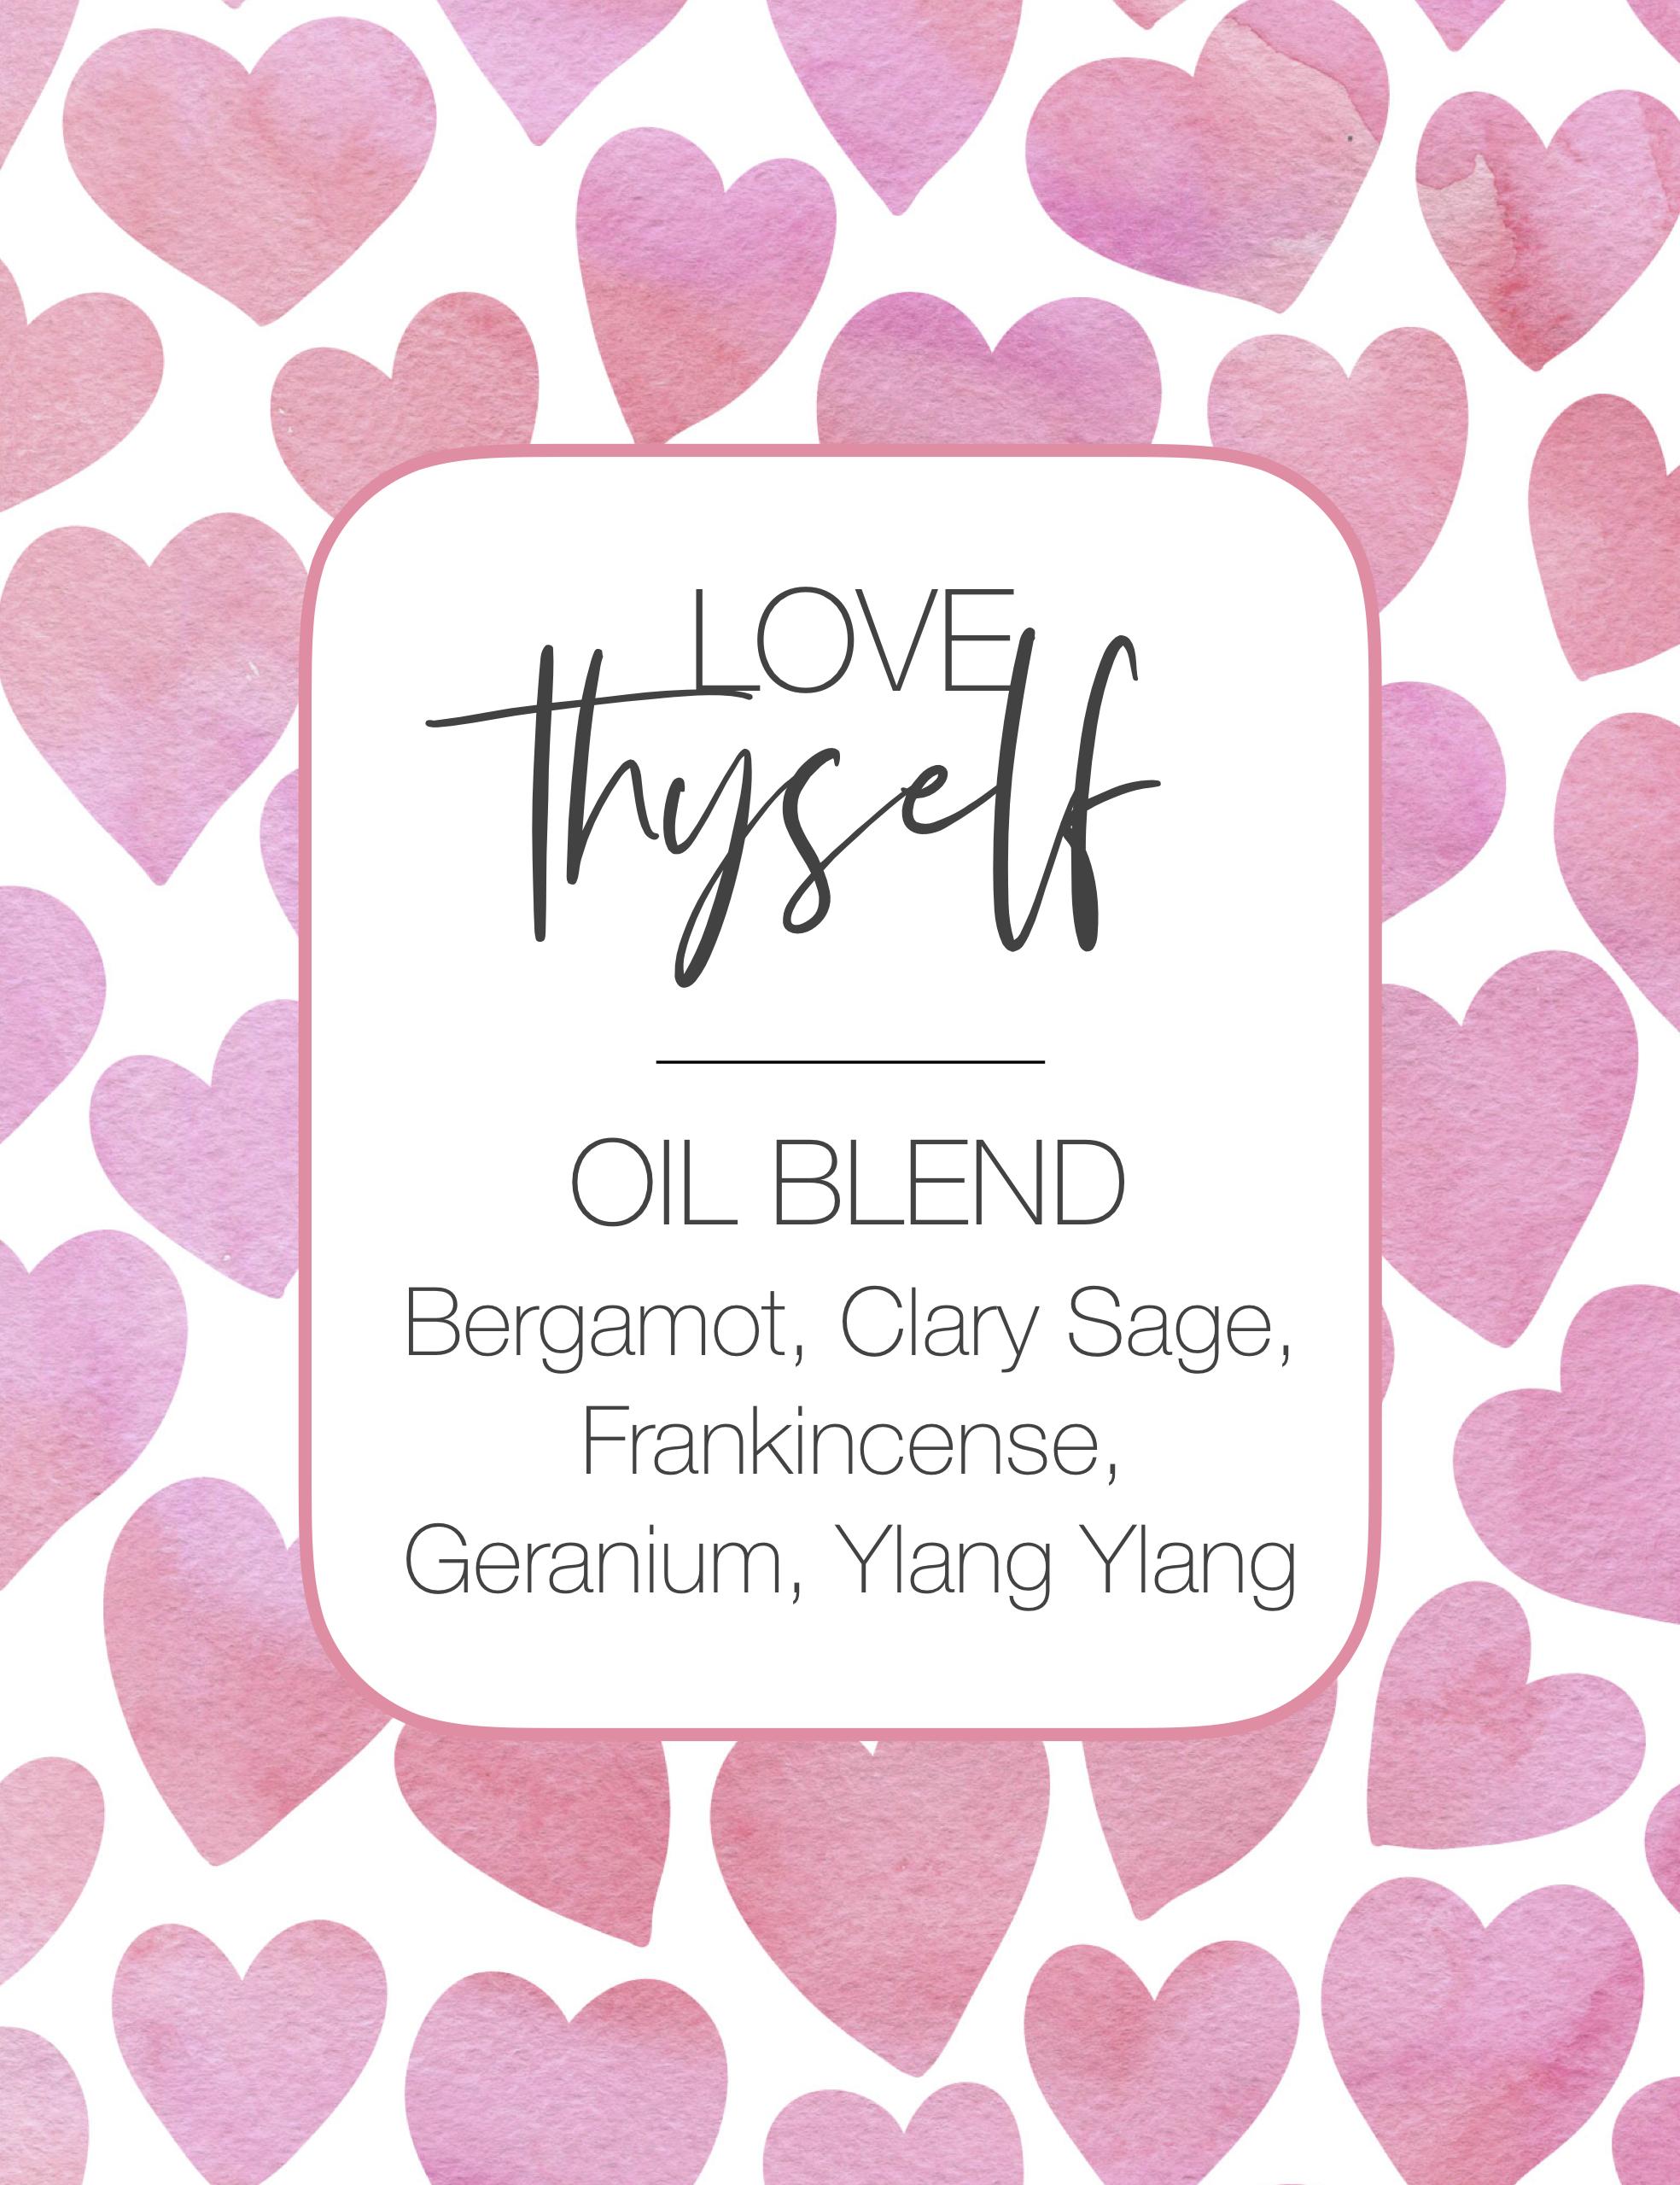 Love-Thyself-10ml-Roller-Bottle-Blend-JPEG-1.jpg